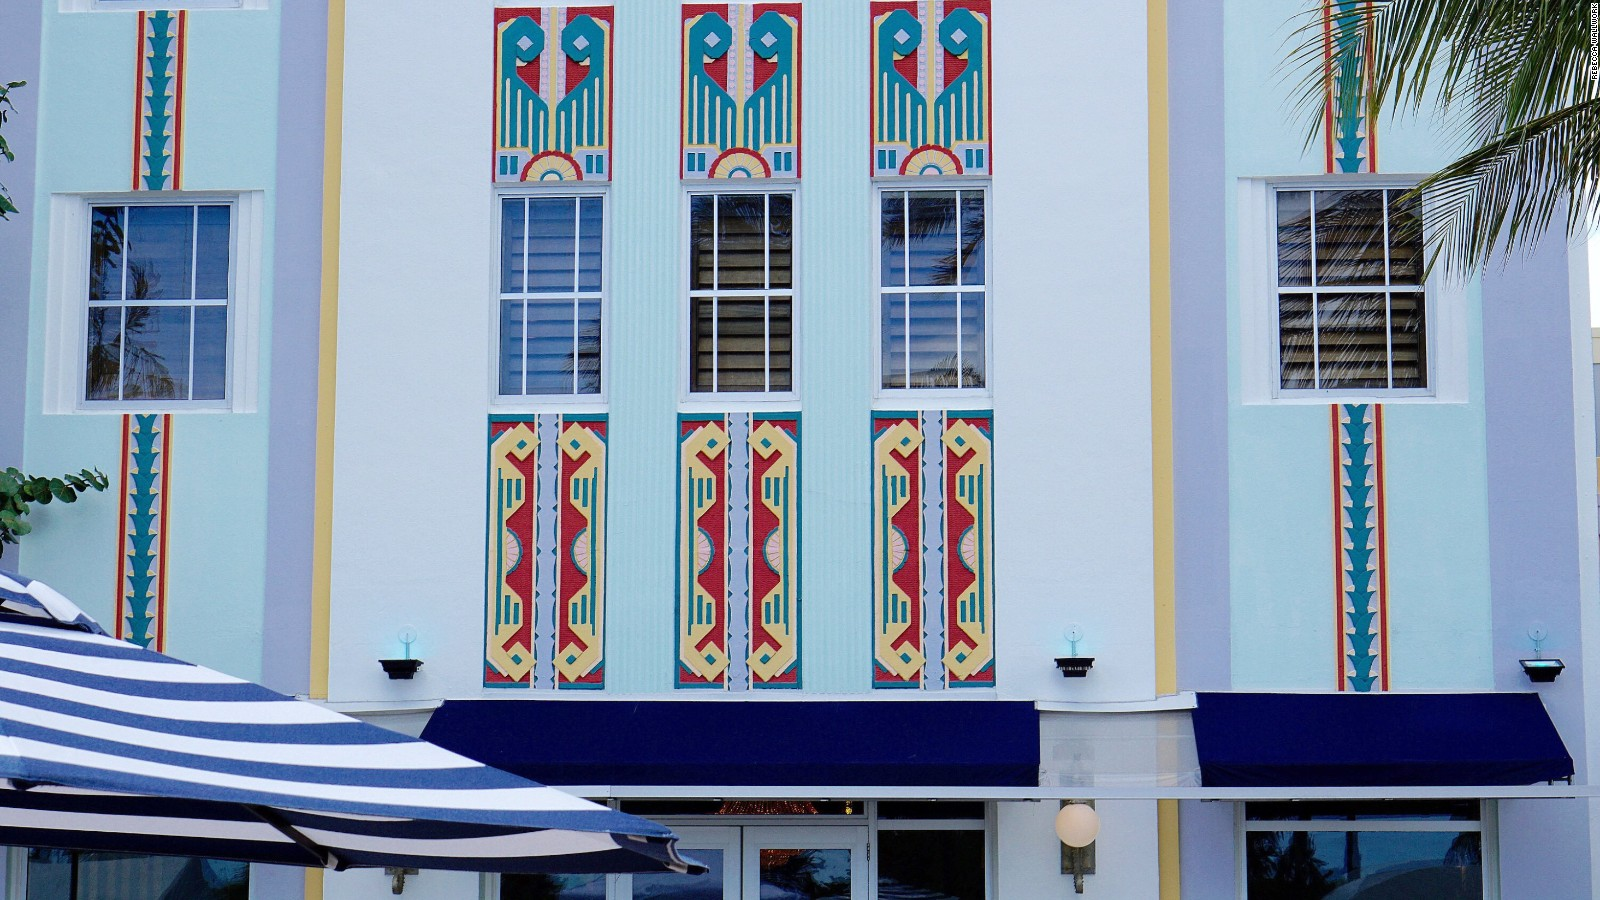 miami beach: art deco around every corner | cnn travel